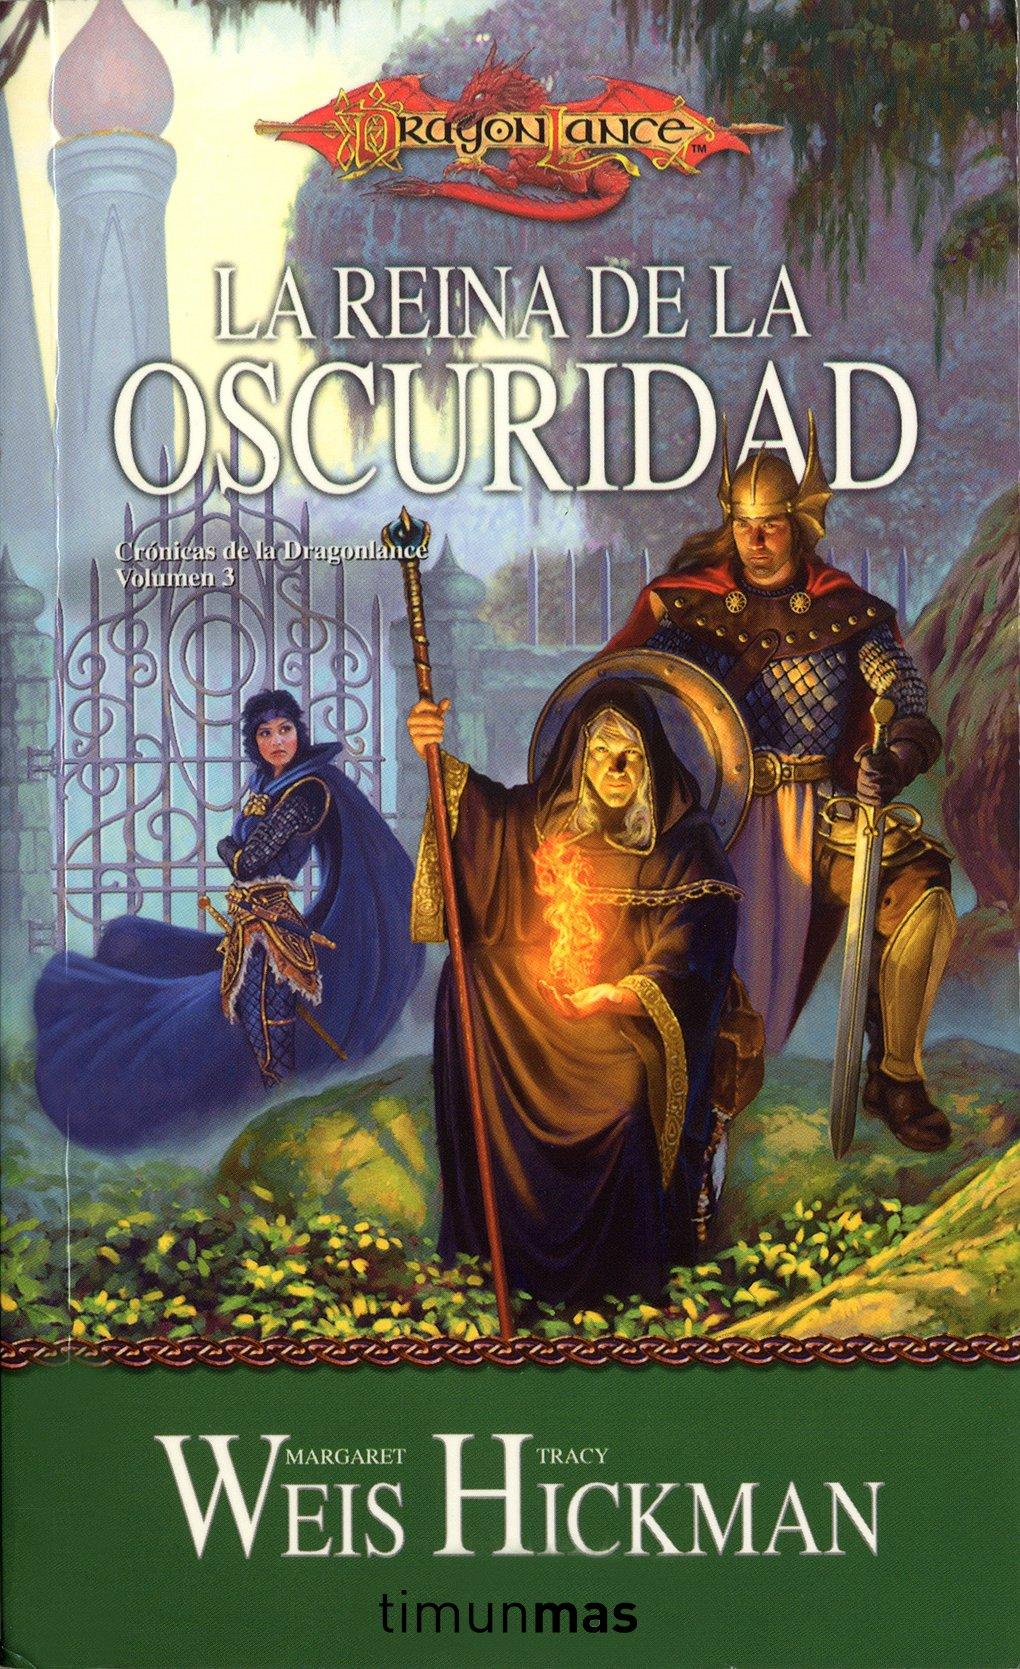 dragonlance libros